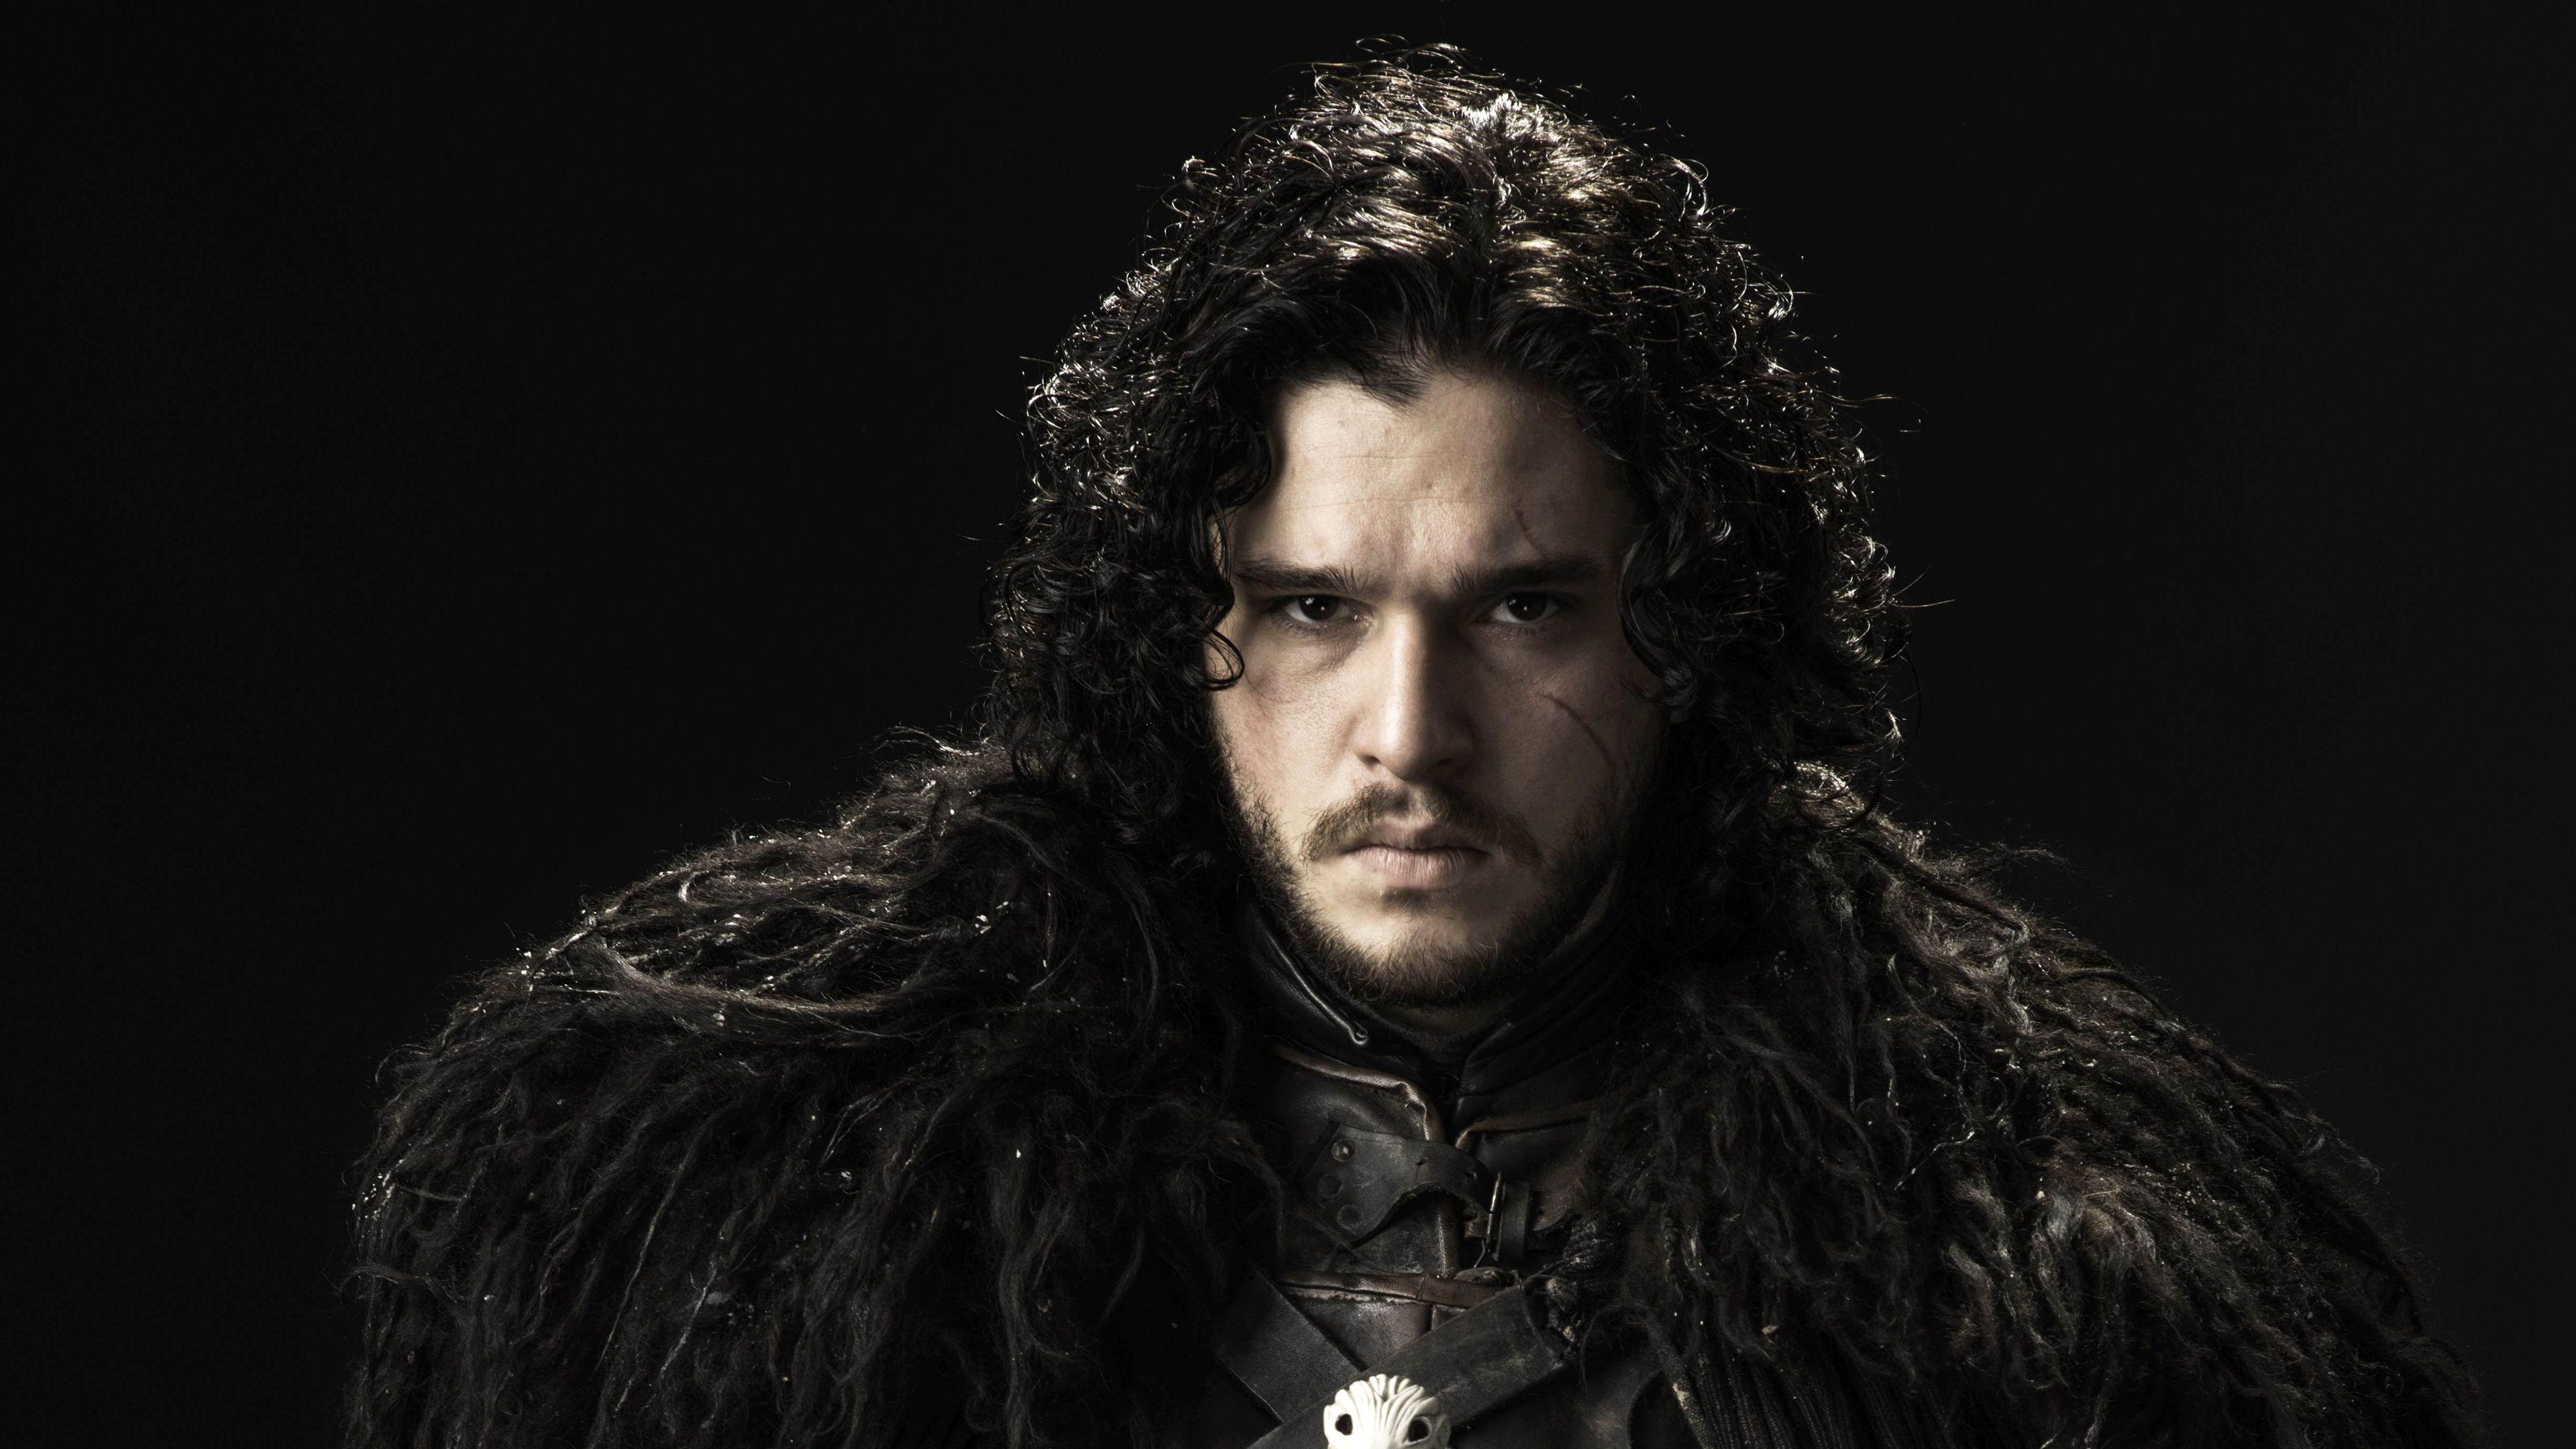 Kit Harington Jon Snow Game Of Thrones Wallpapers Hd Wallpapers